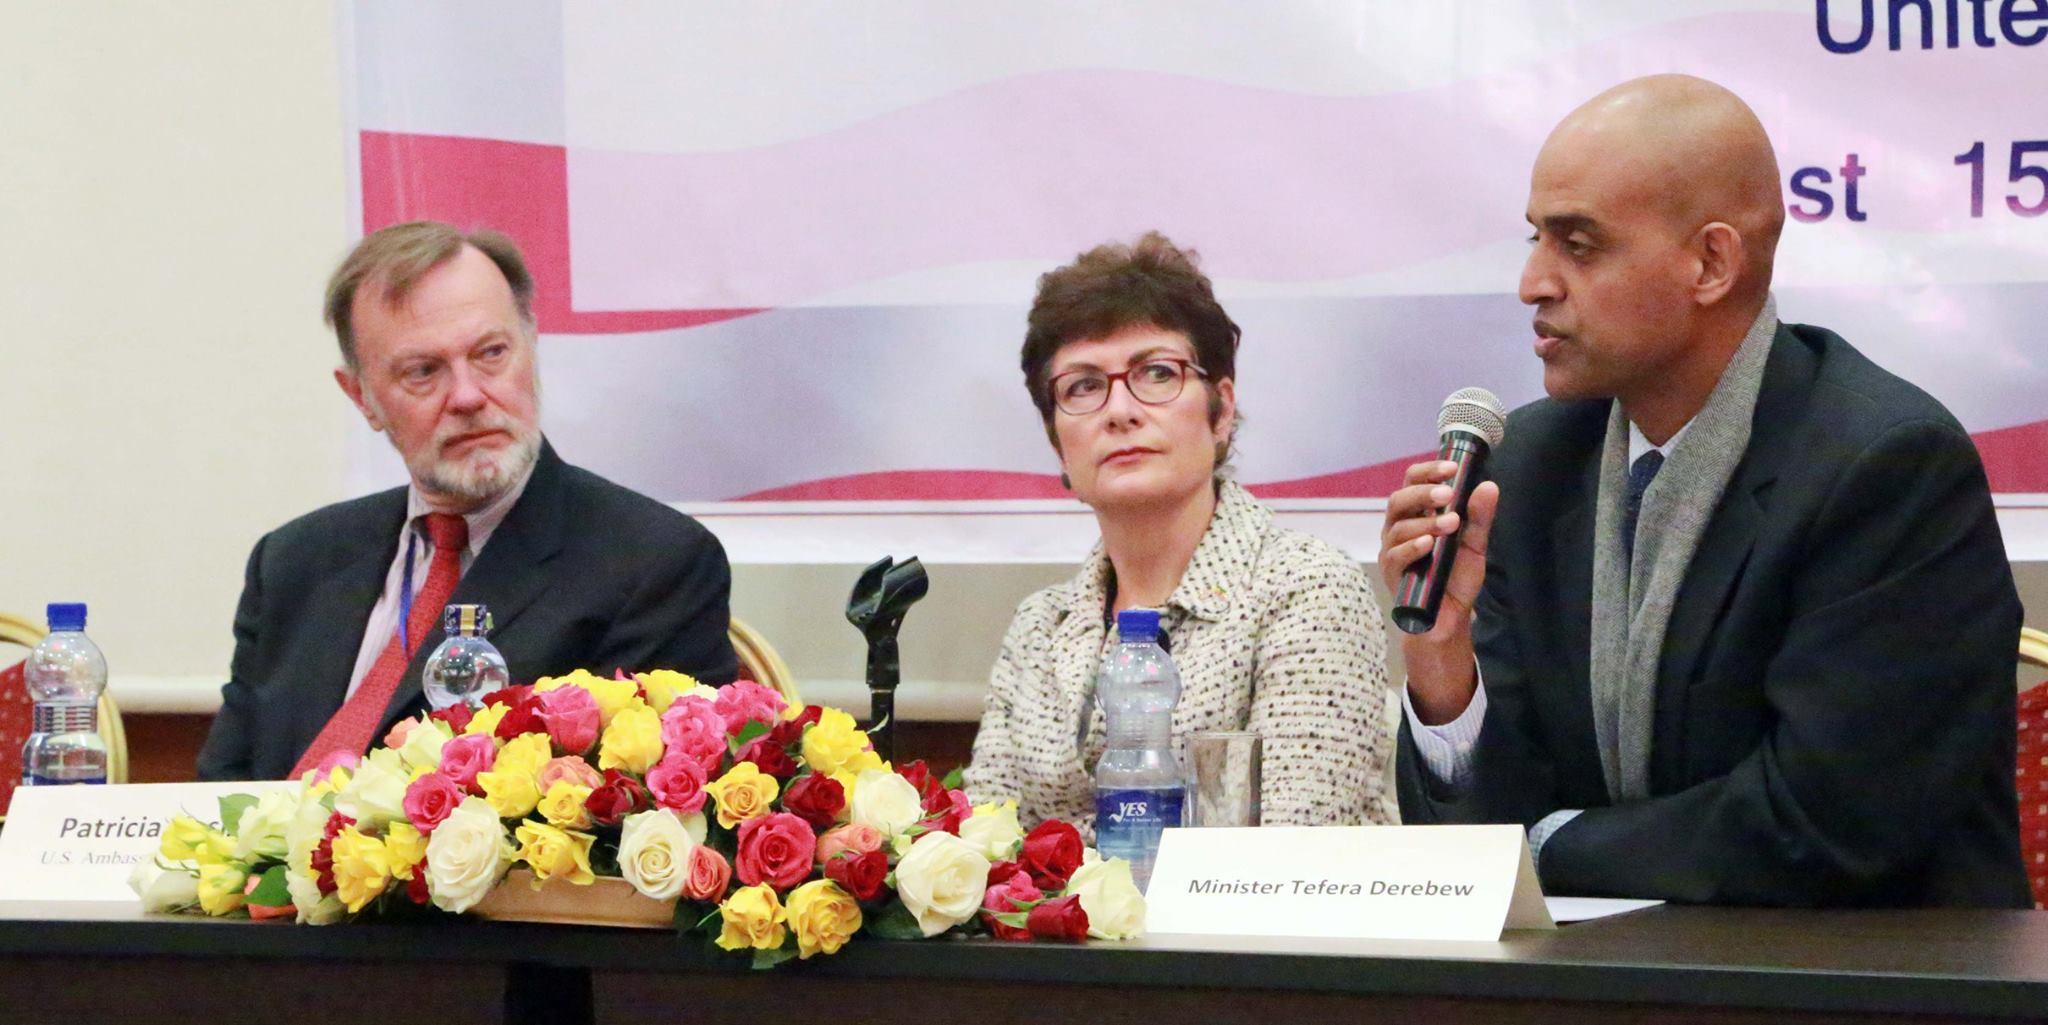 ethiopia USA Partnership Ethiopia, US Keen to Foster Multisector Partnerships